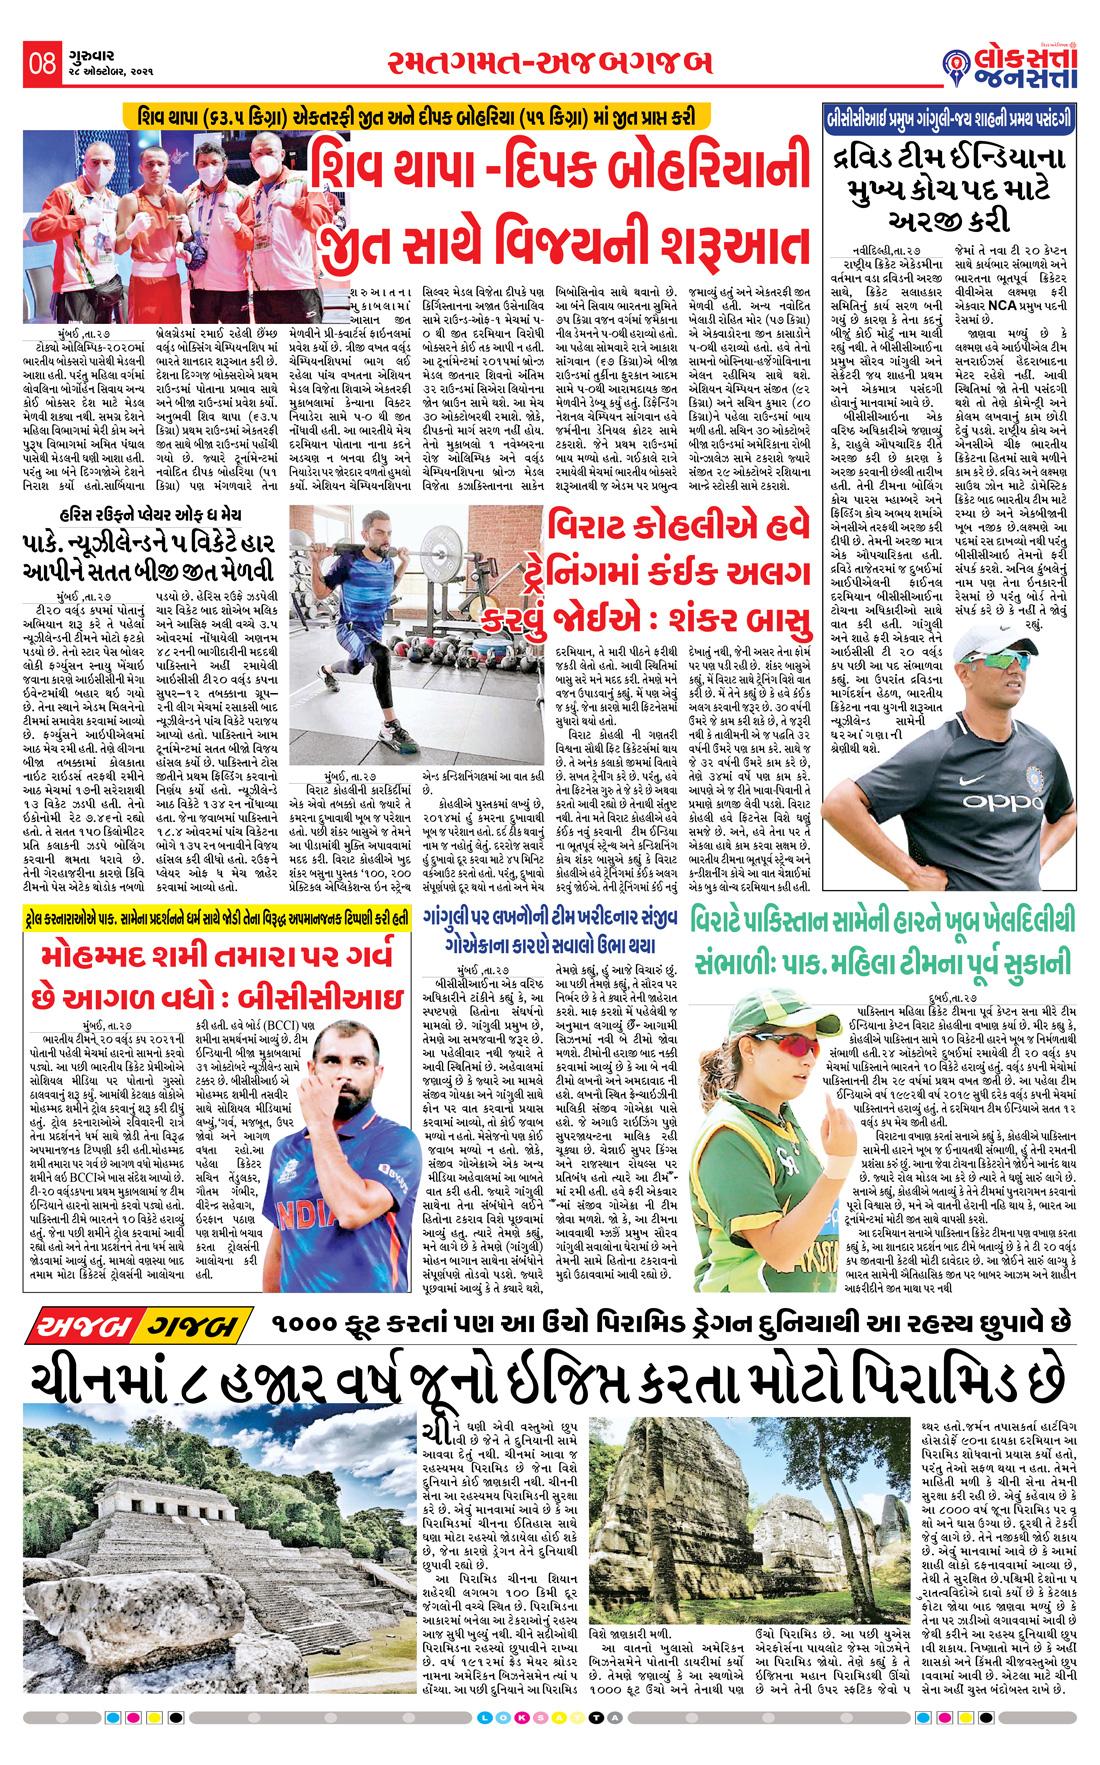 Loksatta Jansatta News Papaer E-paper dated 2021-10-28   Page 8